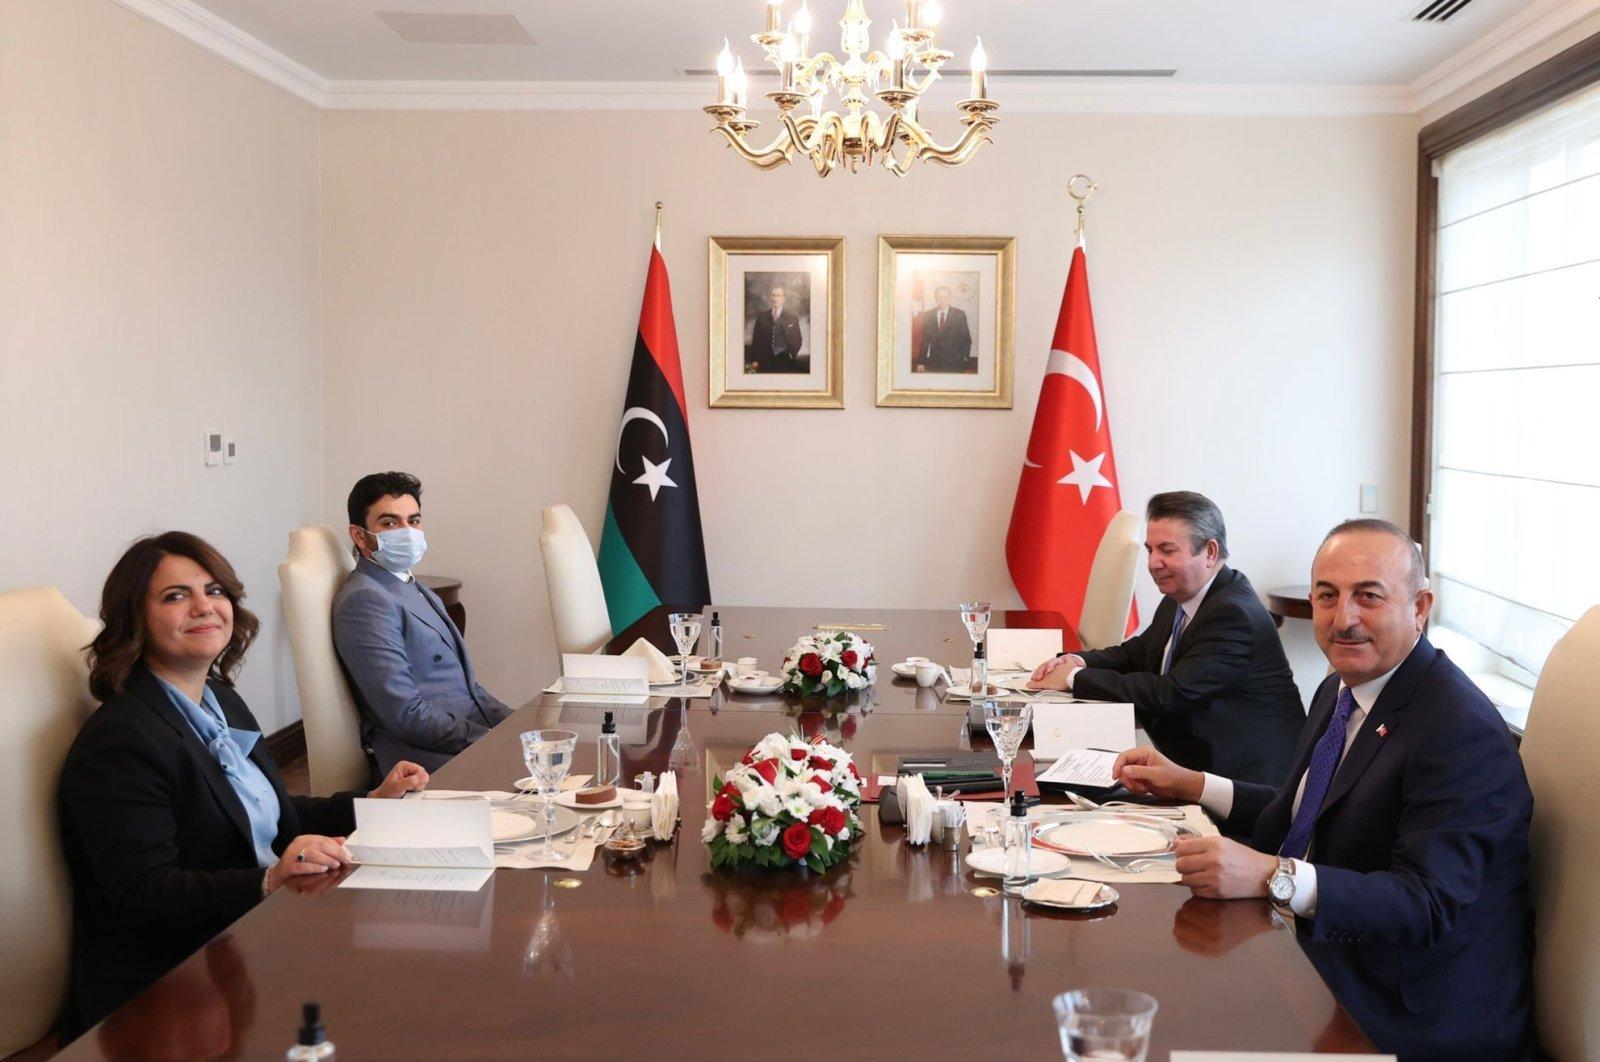 Foreign Minister Mevlüt Çavuşoğlu (R-Front) receives Libyan Foreign Minister Najla Mangoush (L-Front) in the capital Ankara, Turkey, Oct. 14, 2021. (AA Photo)